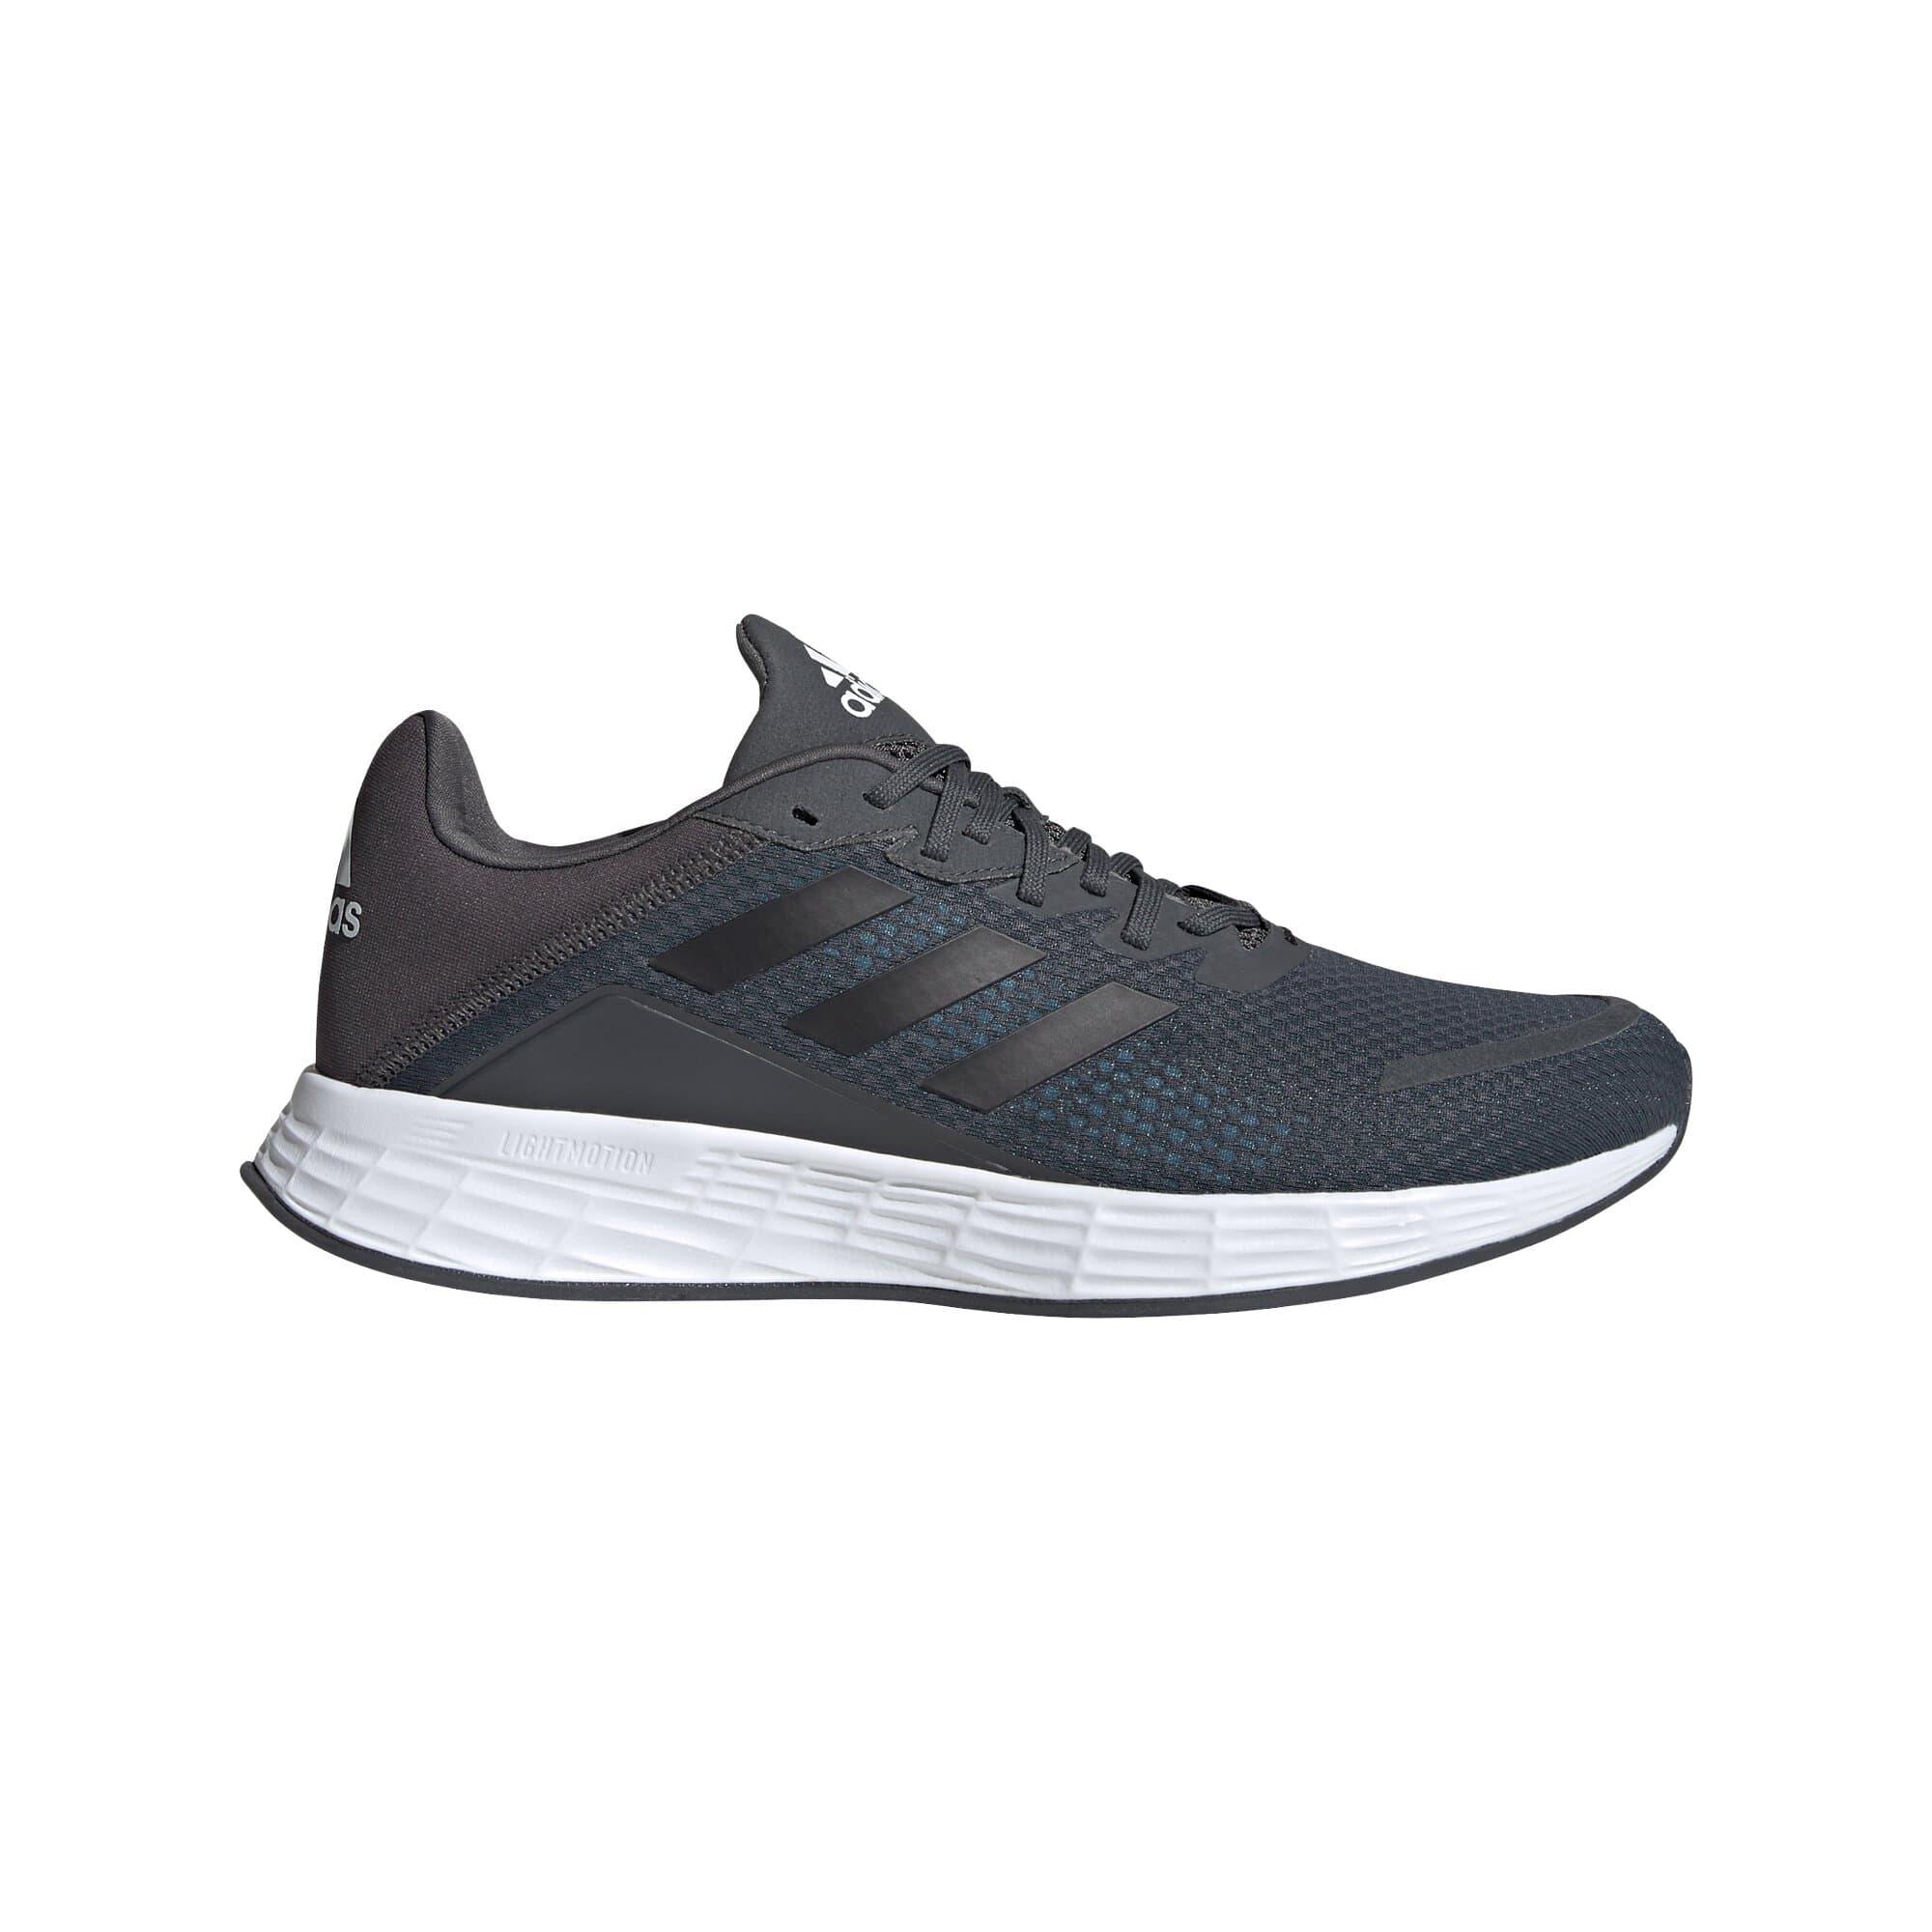 Adidas Duramo SL Herren-Freizeitschuh